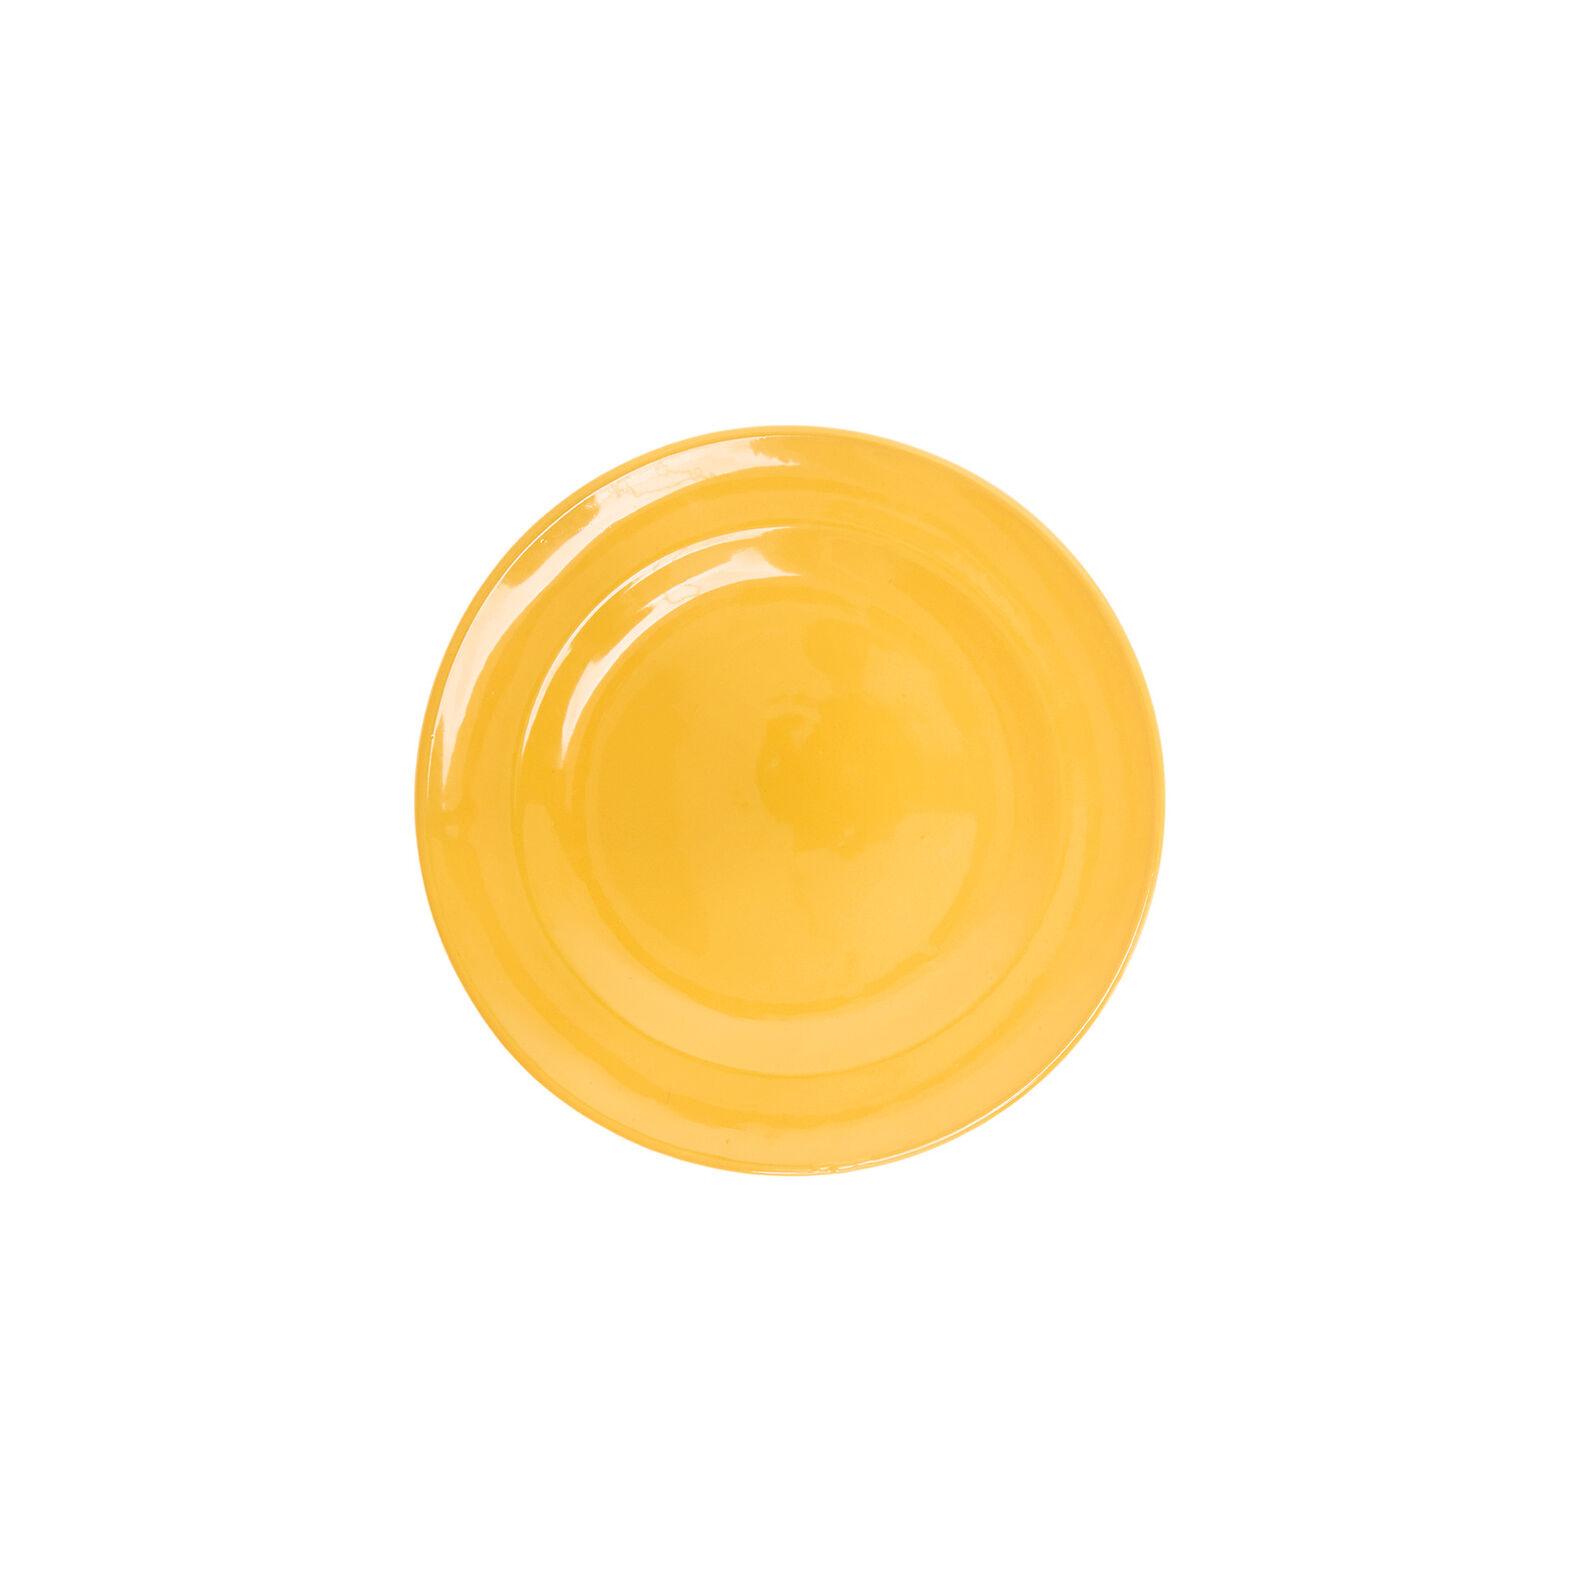 Nicola Fasano Grottaglie ceramic side plate